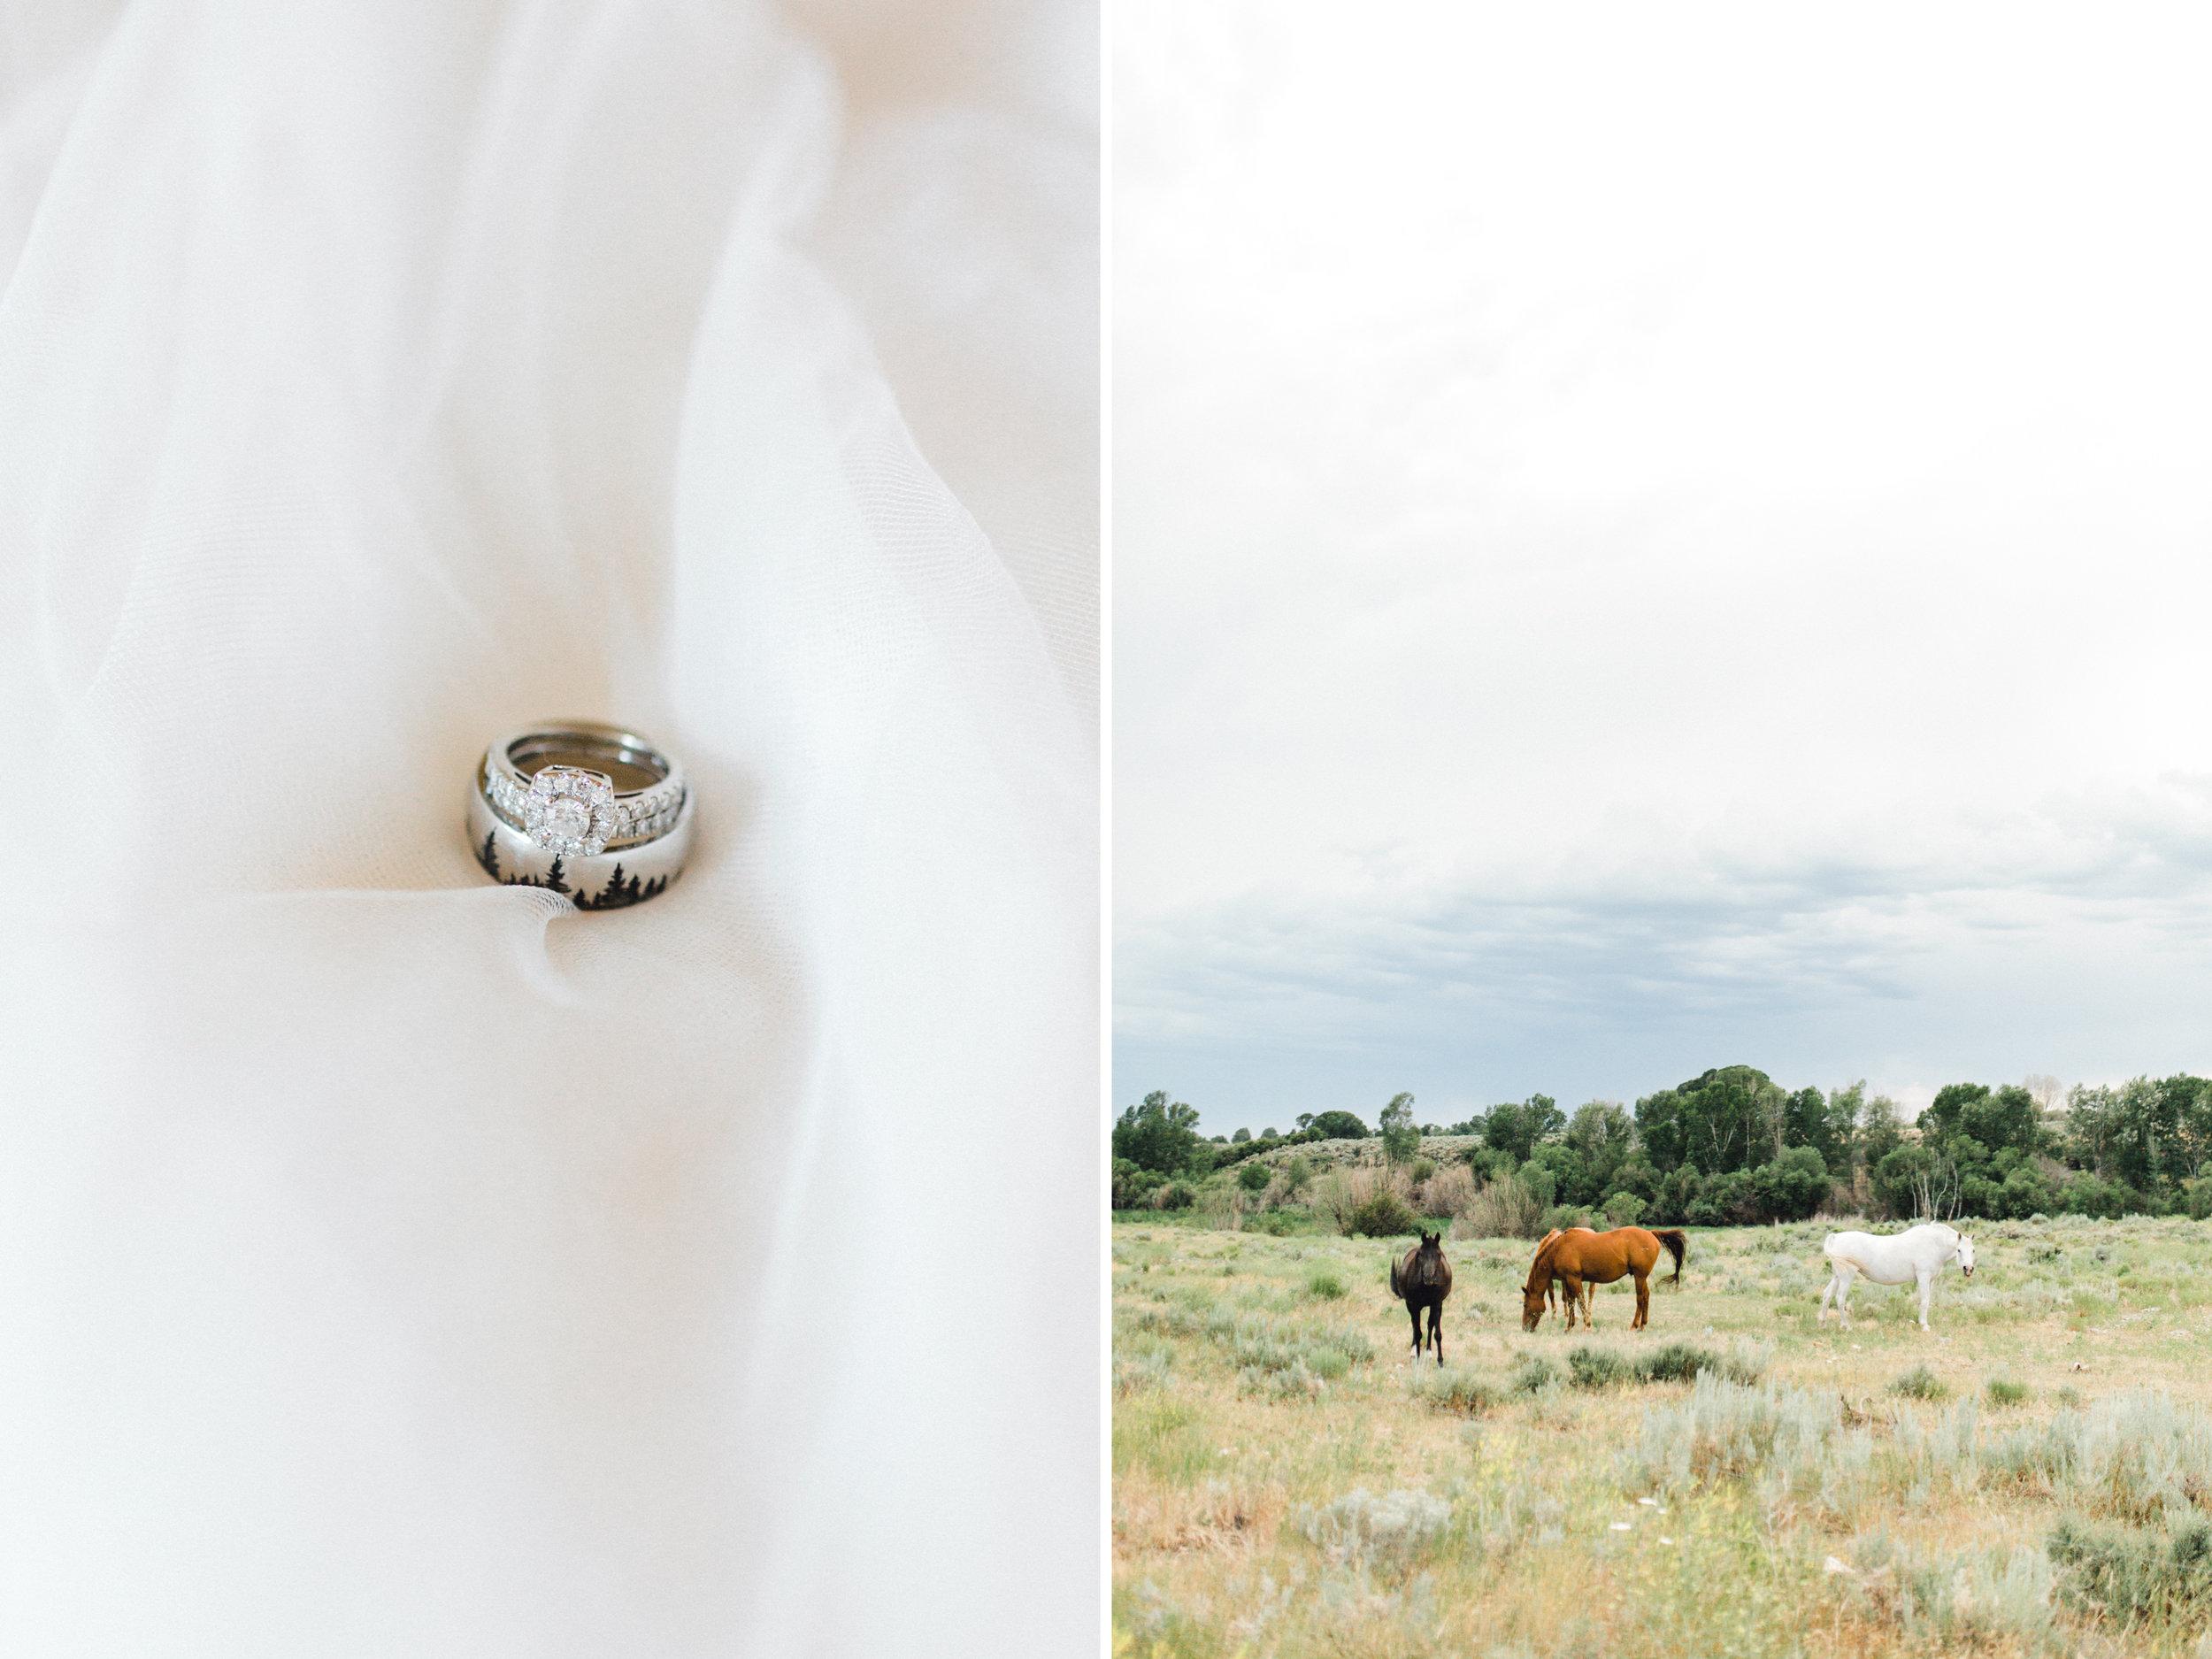 country-outdoor-rustic-wedding-tetons-idaho-anna-christine-photo-11.jpg